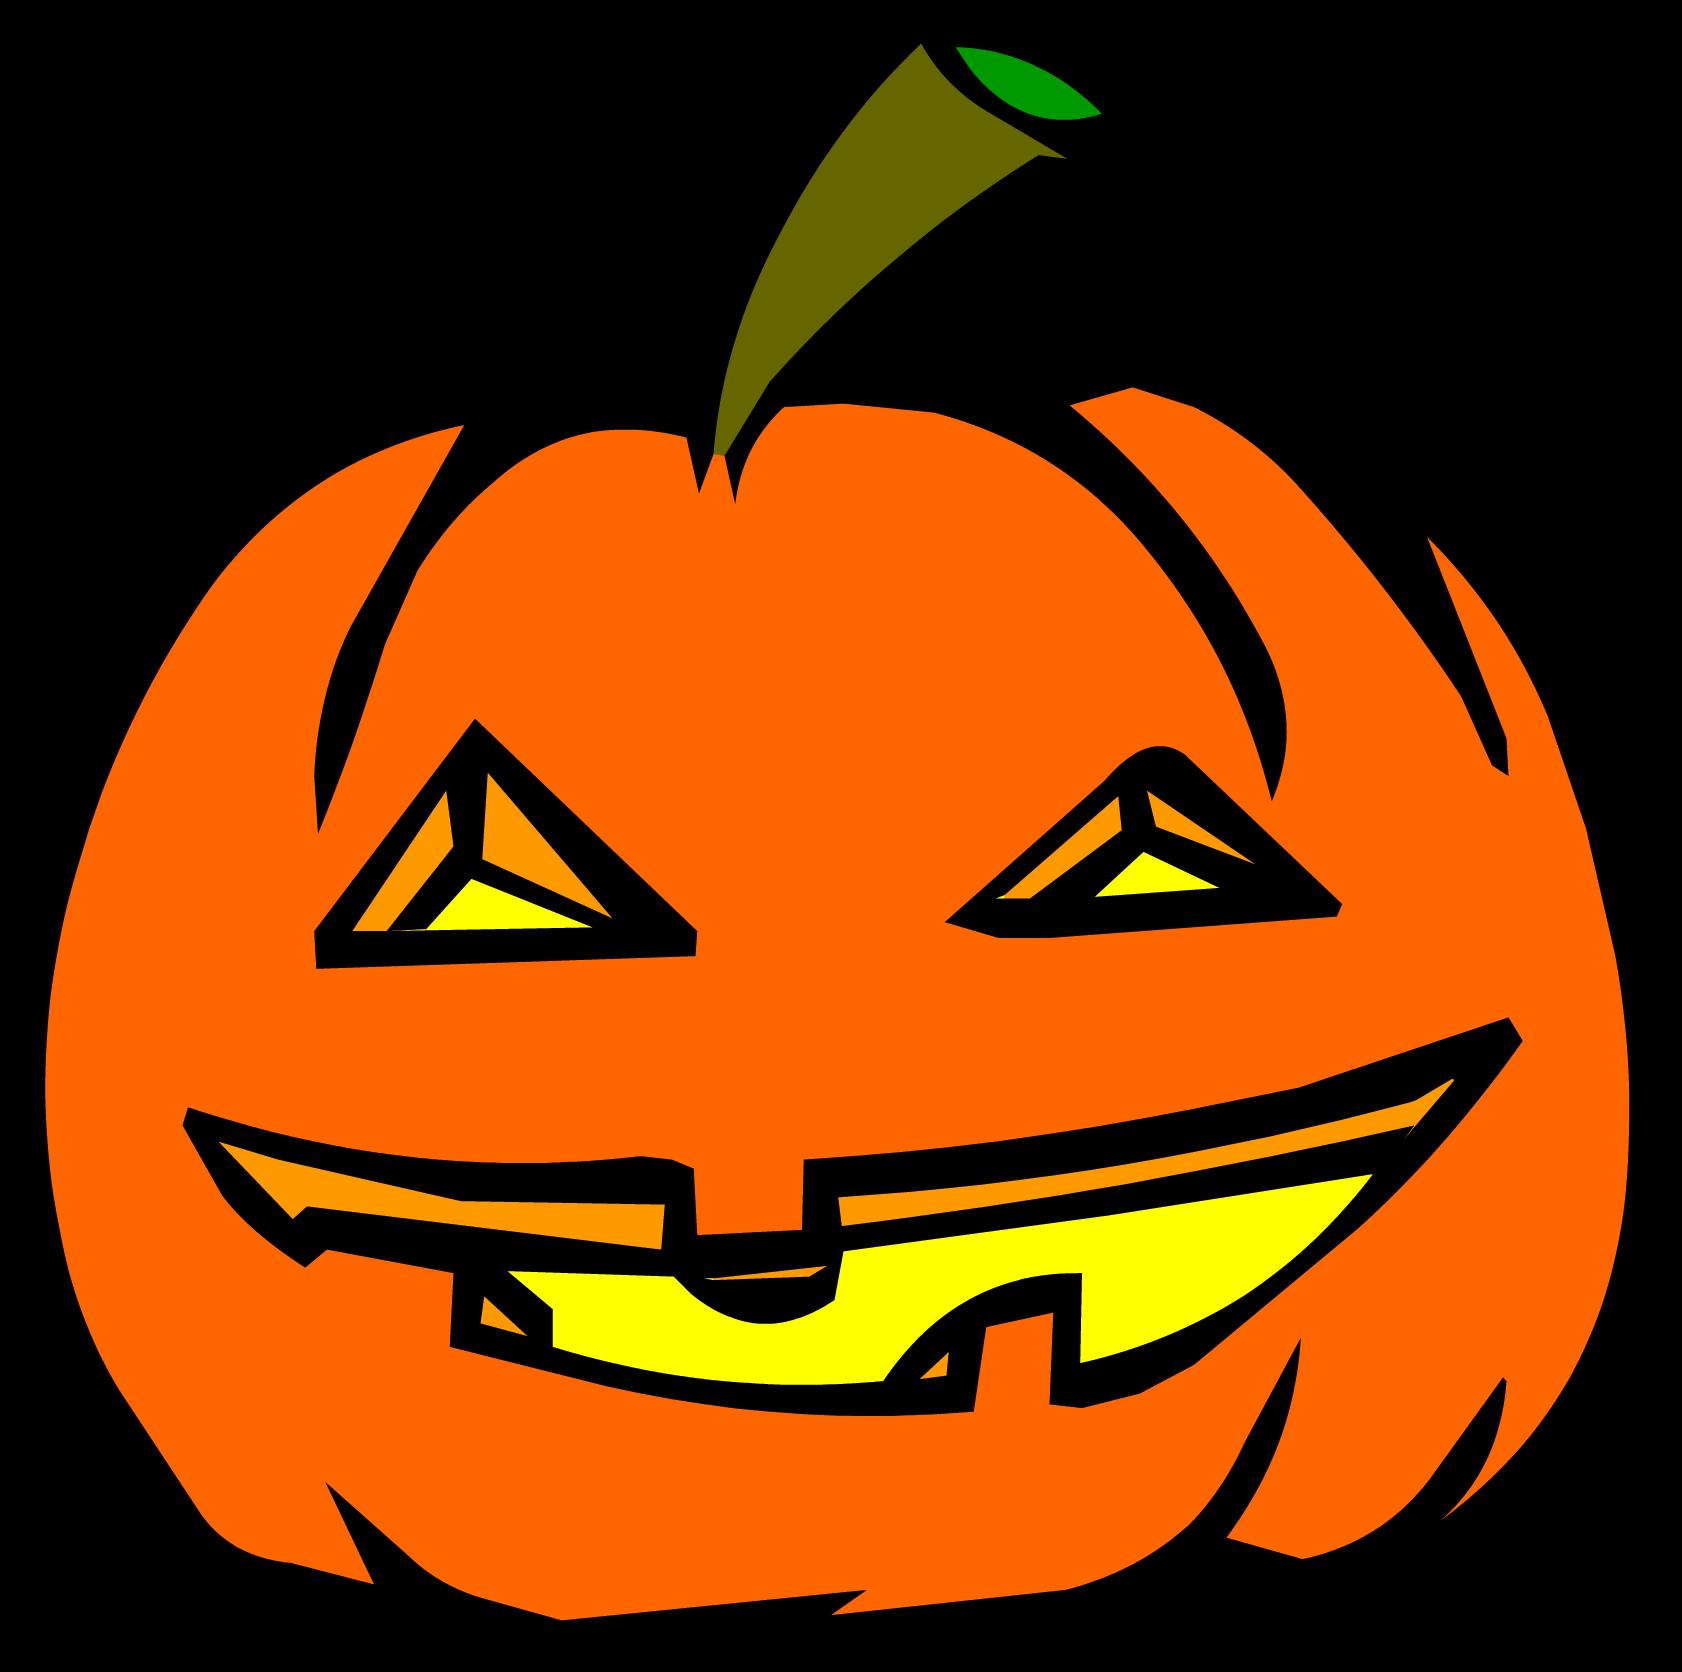 Happy Jack O Lantern Clipart